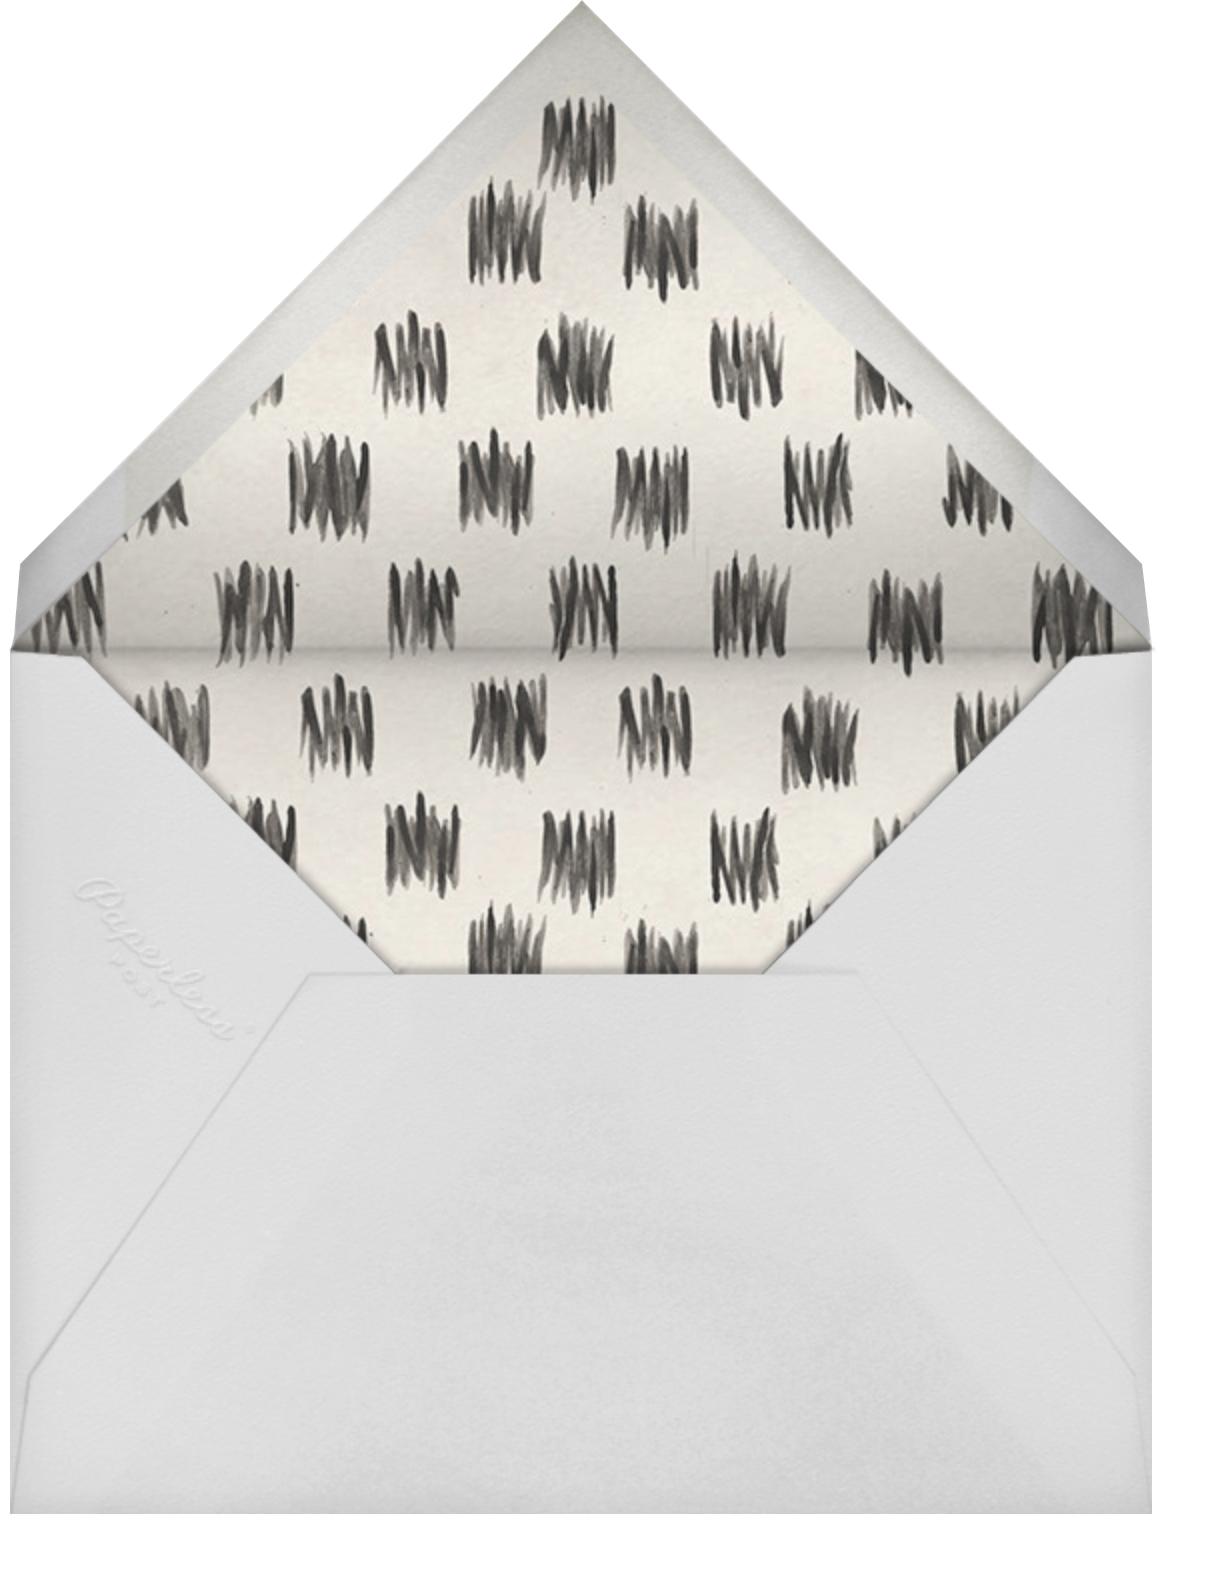 Champagne Toast II - Kelly Wearstler - Engagement party - envelope back